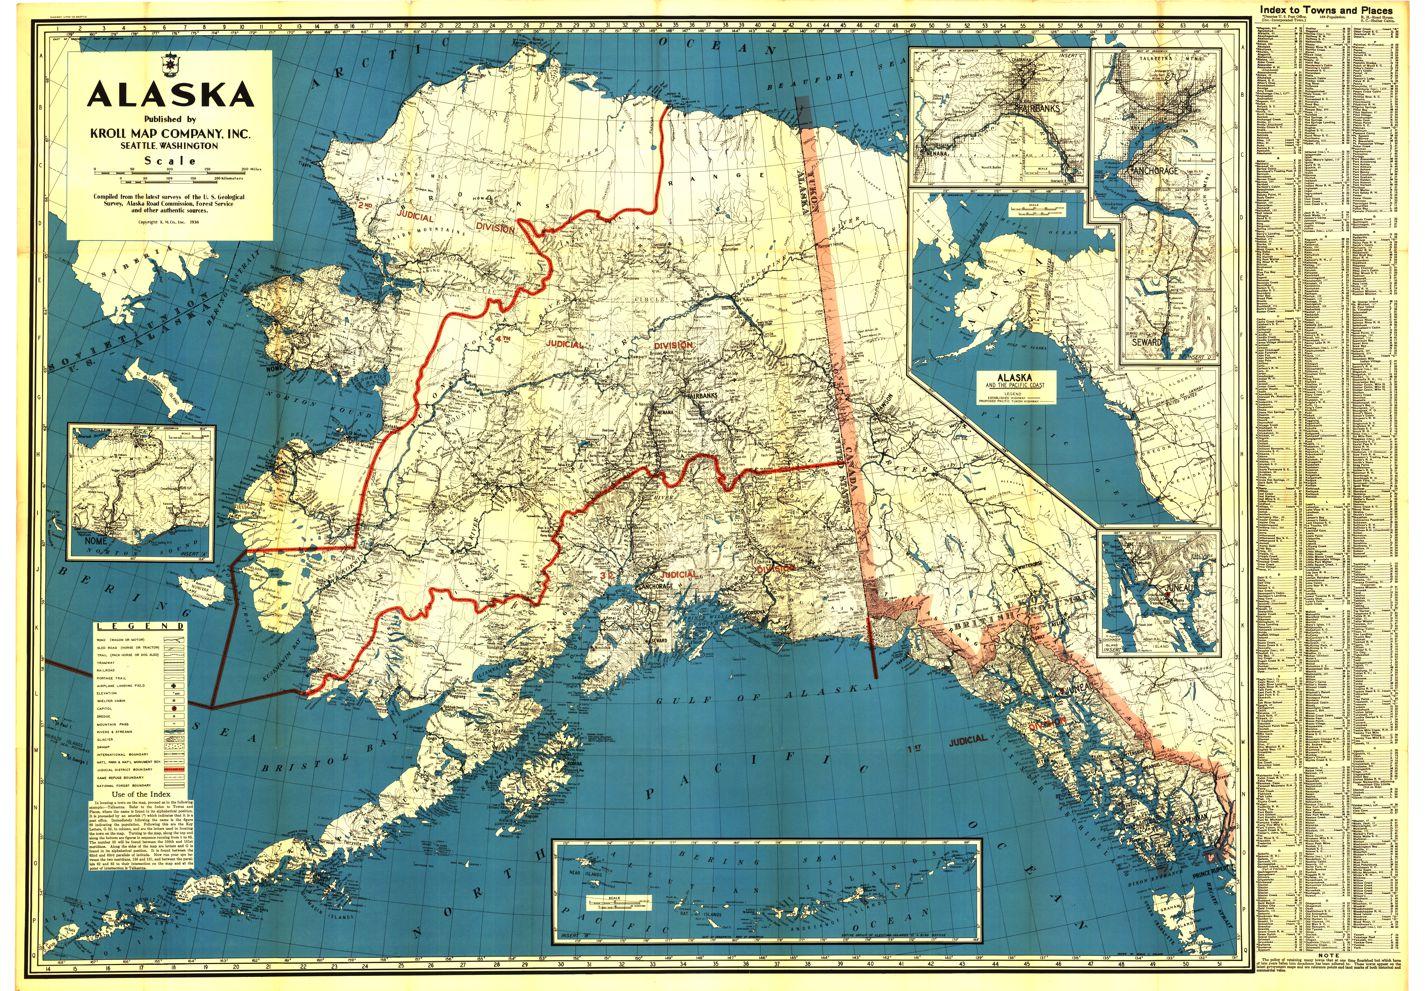 Alaska Historical Maps - Kroll Map Company